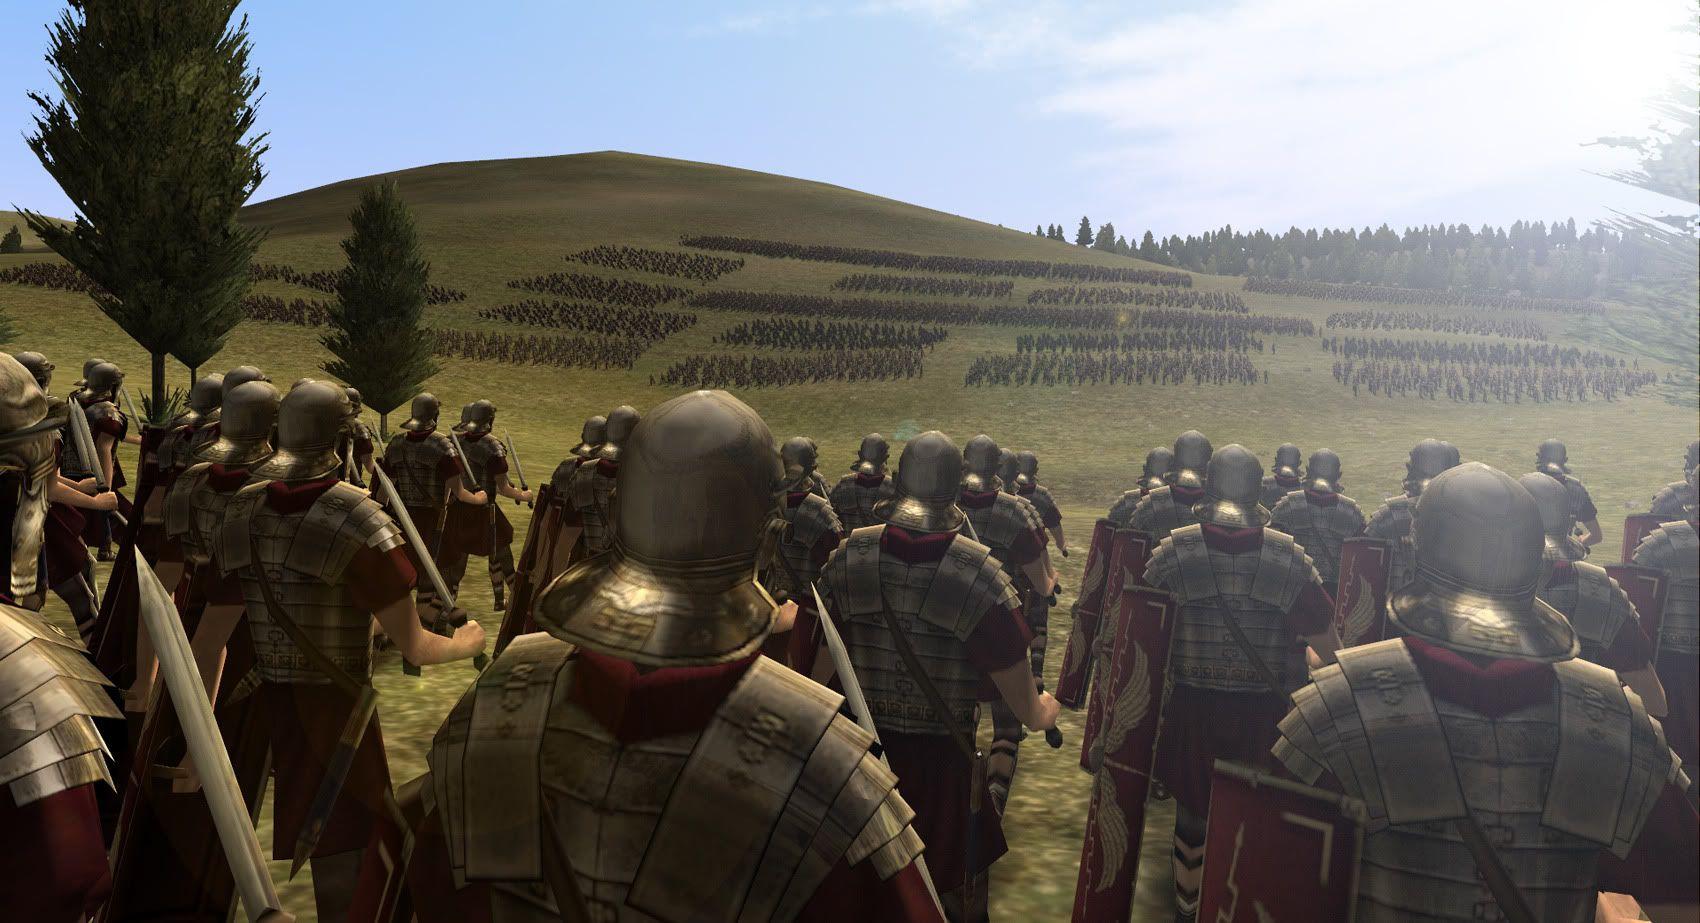 Roman Legions Wallpaper Roman Empire Wallpaper Marble Iphone Wallpaper Roman Empire